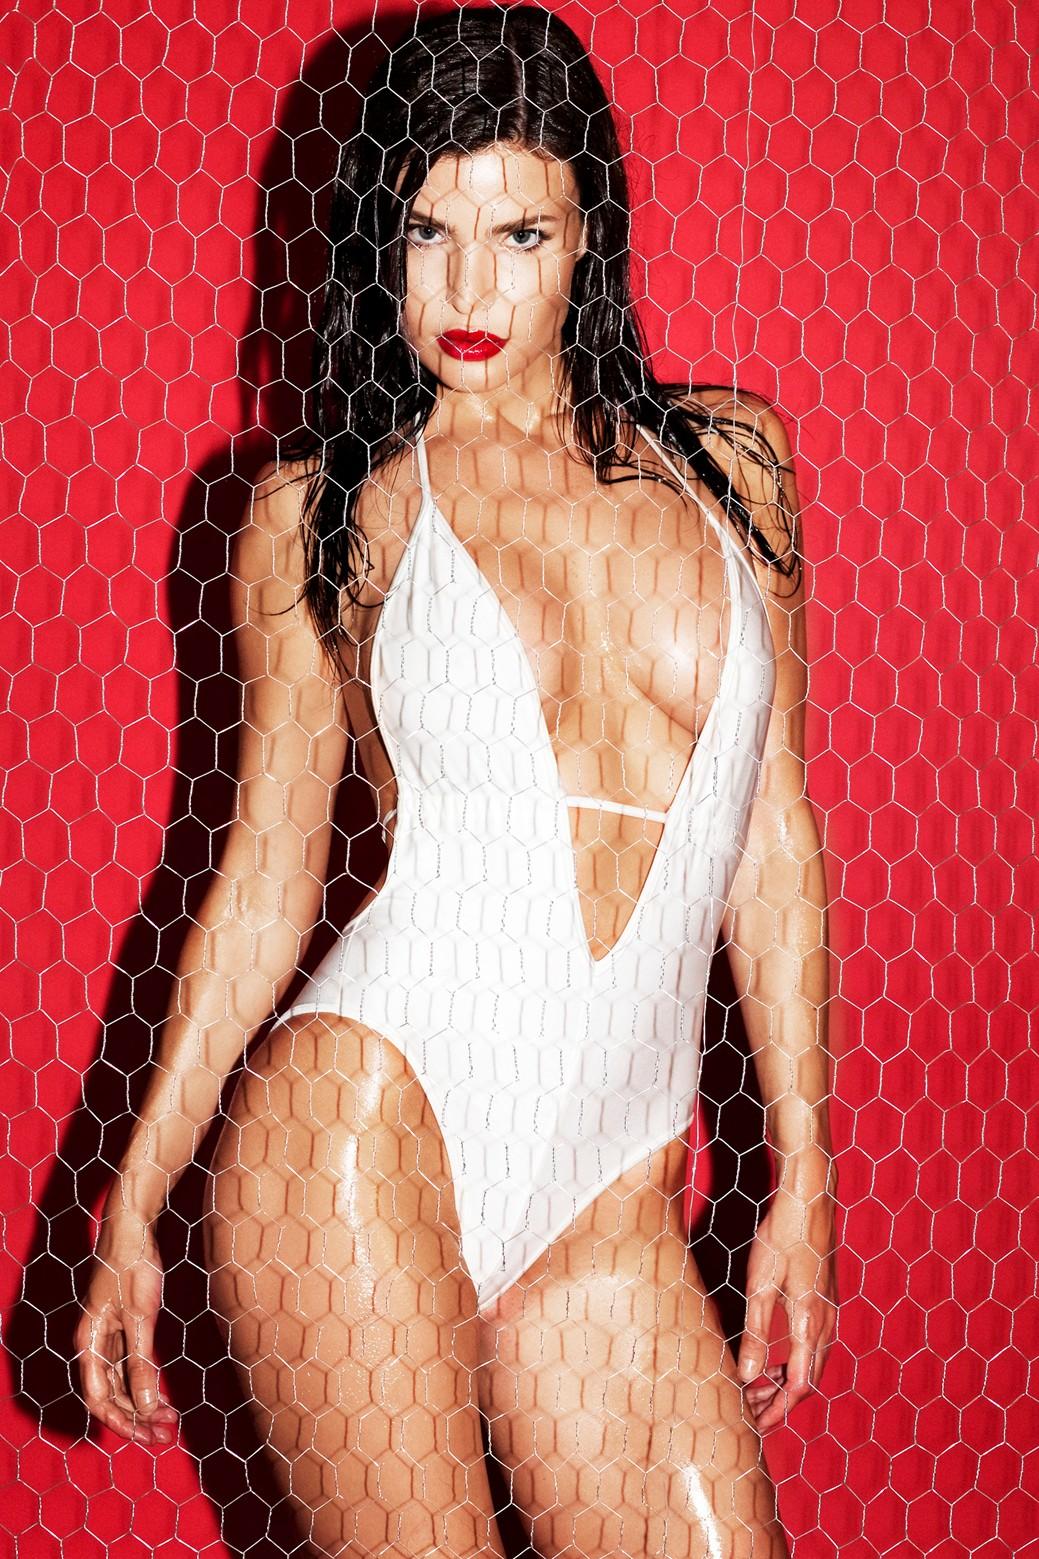 Julia Lescova, sexy, beautiful, red hot